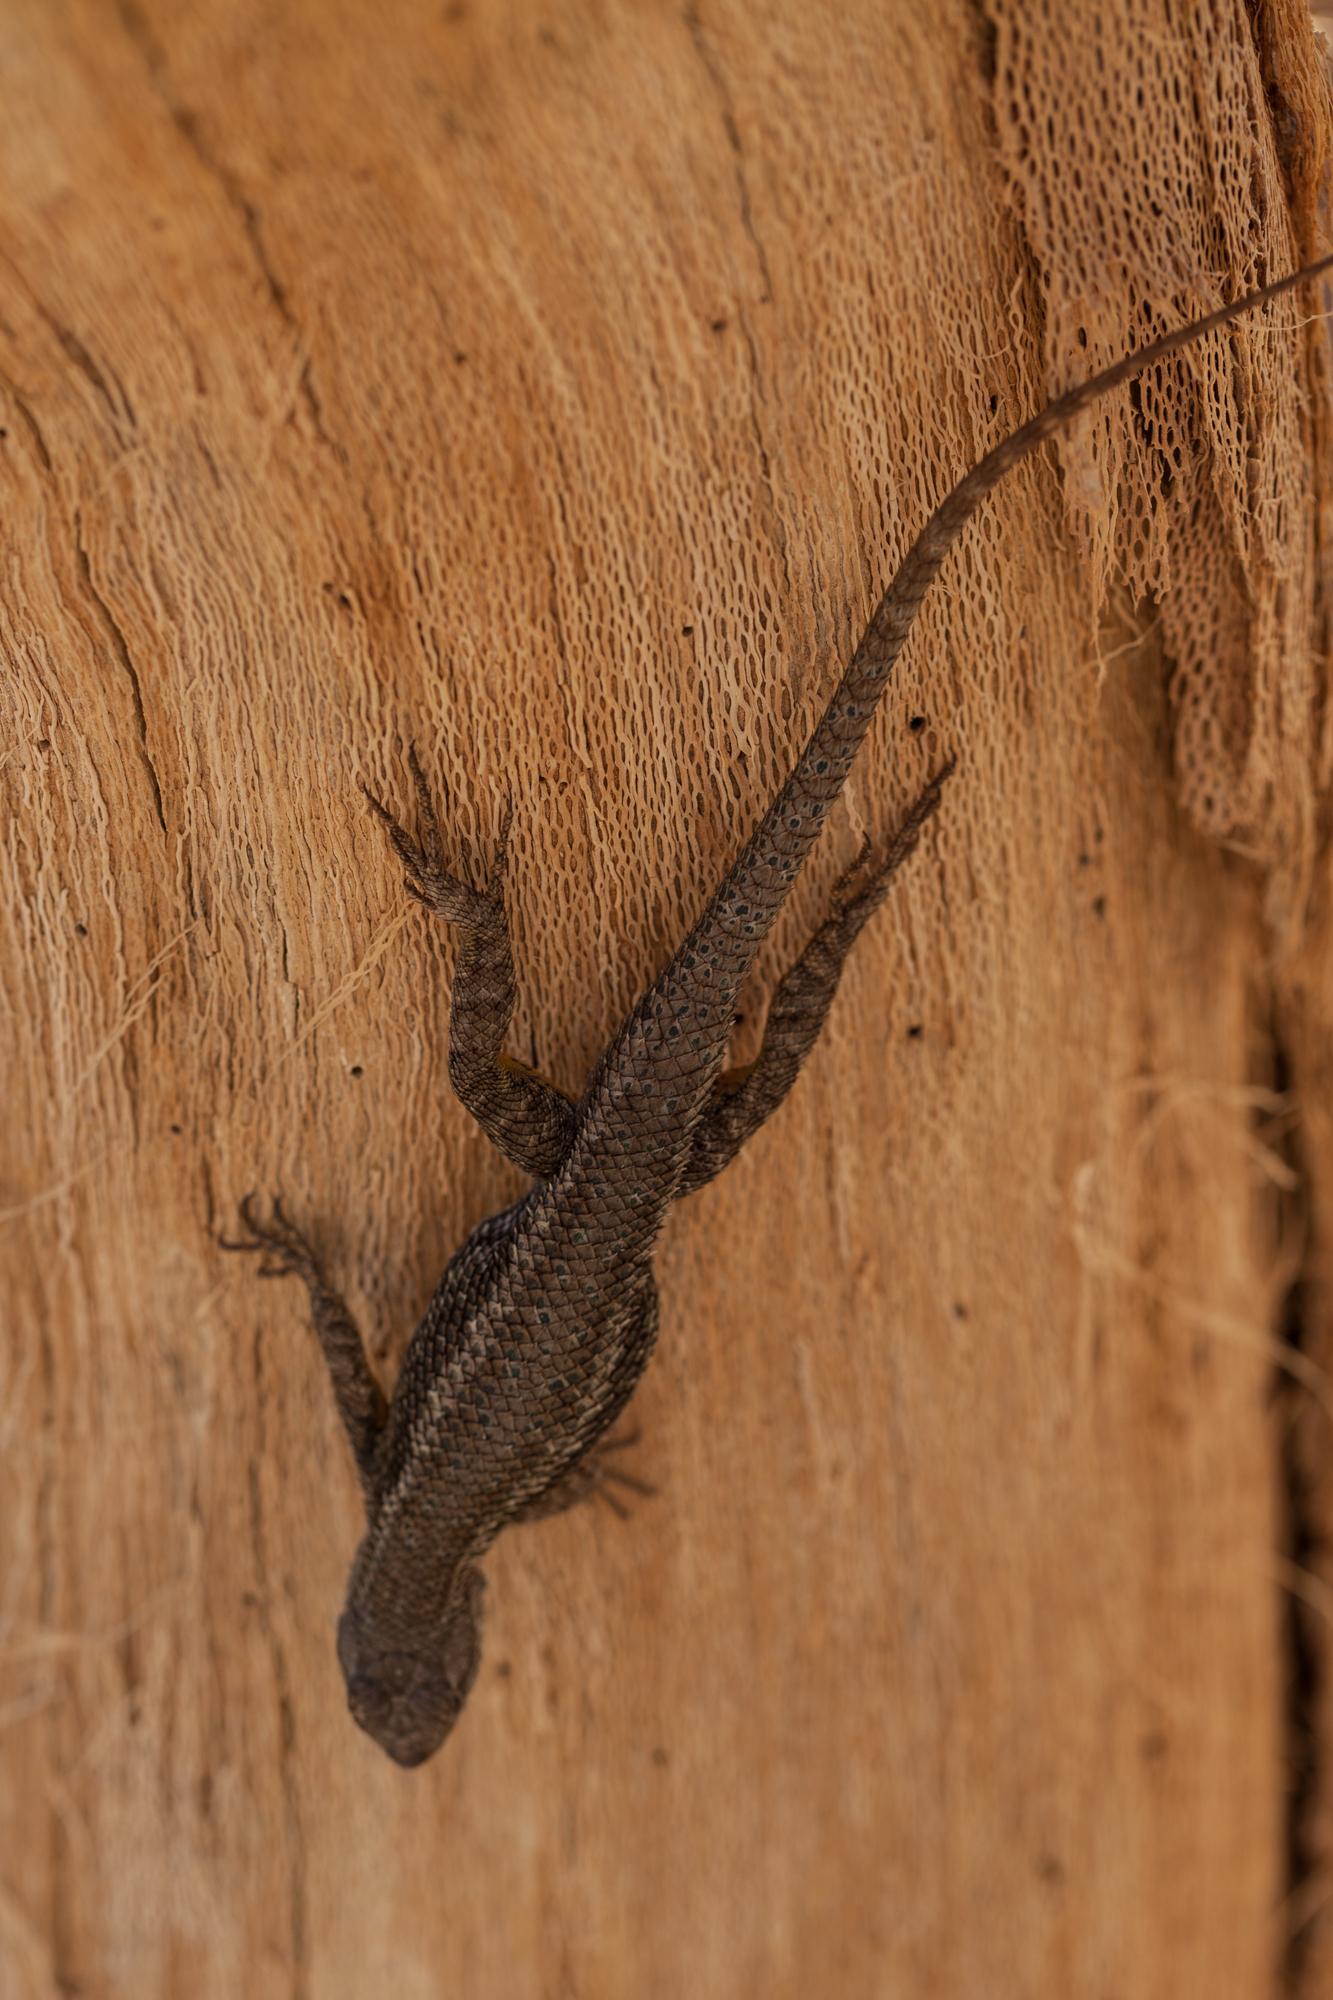 lizard-fullerton-arboretum.jpg